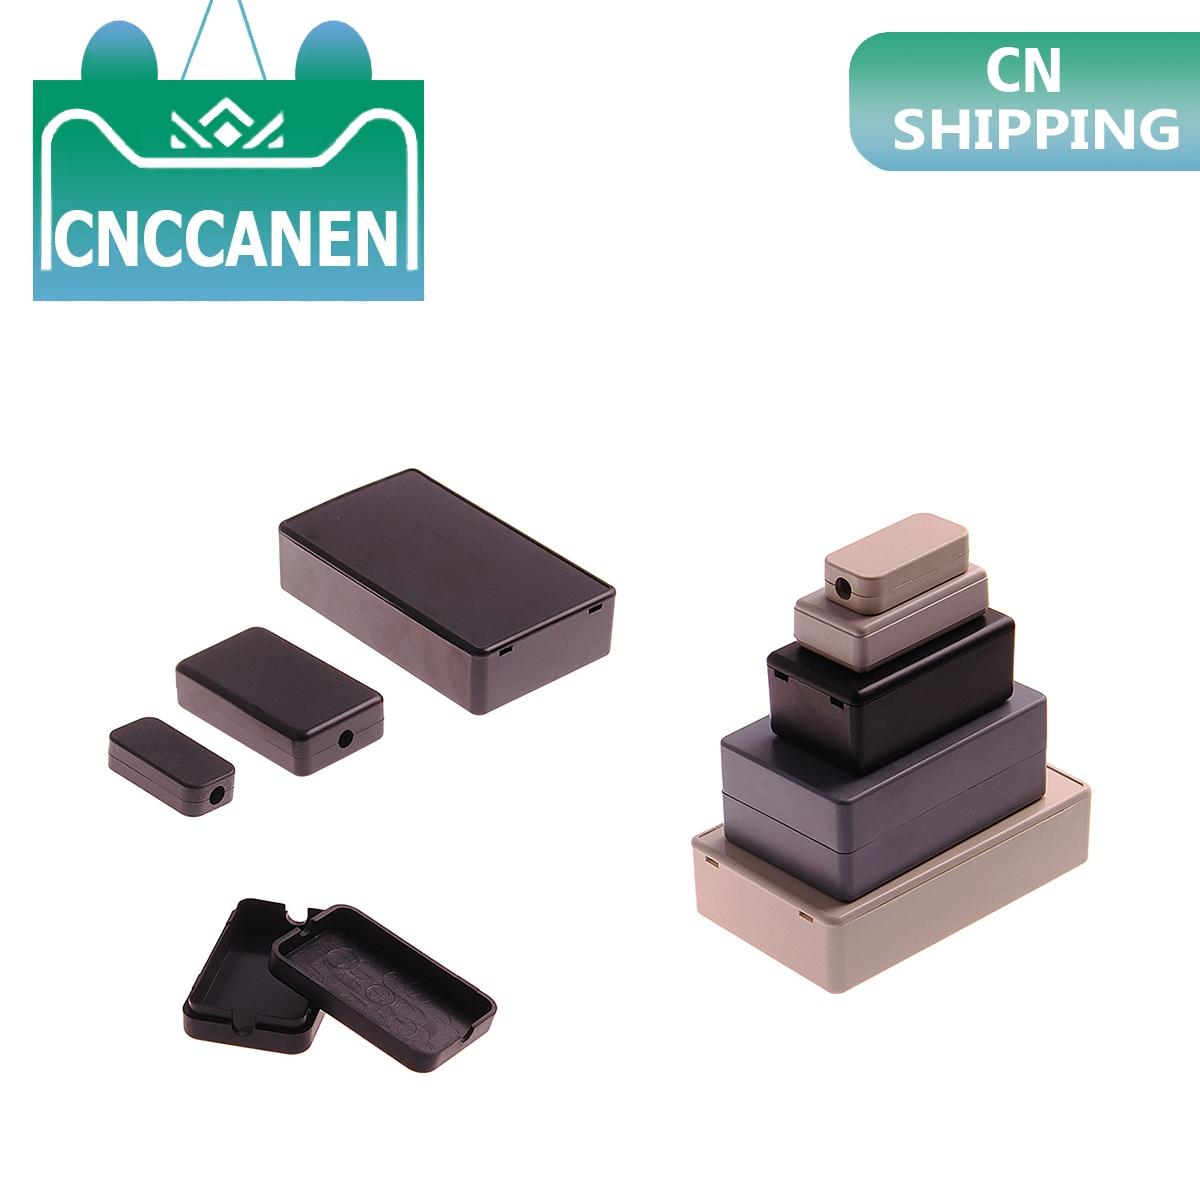 1PC New DIY Housing Instrument Case Black White ABS Plastic Project Box Storage Case Enclosure Boxes Electronic Supplies